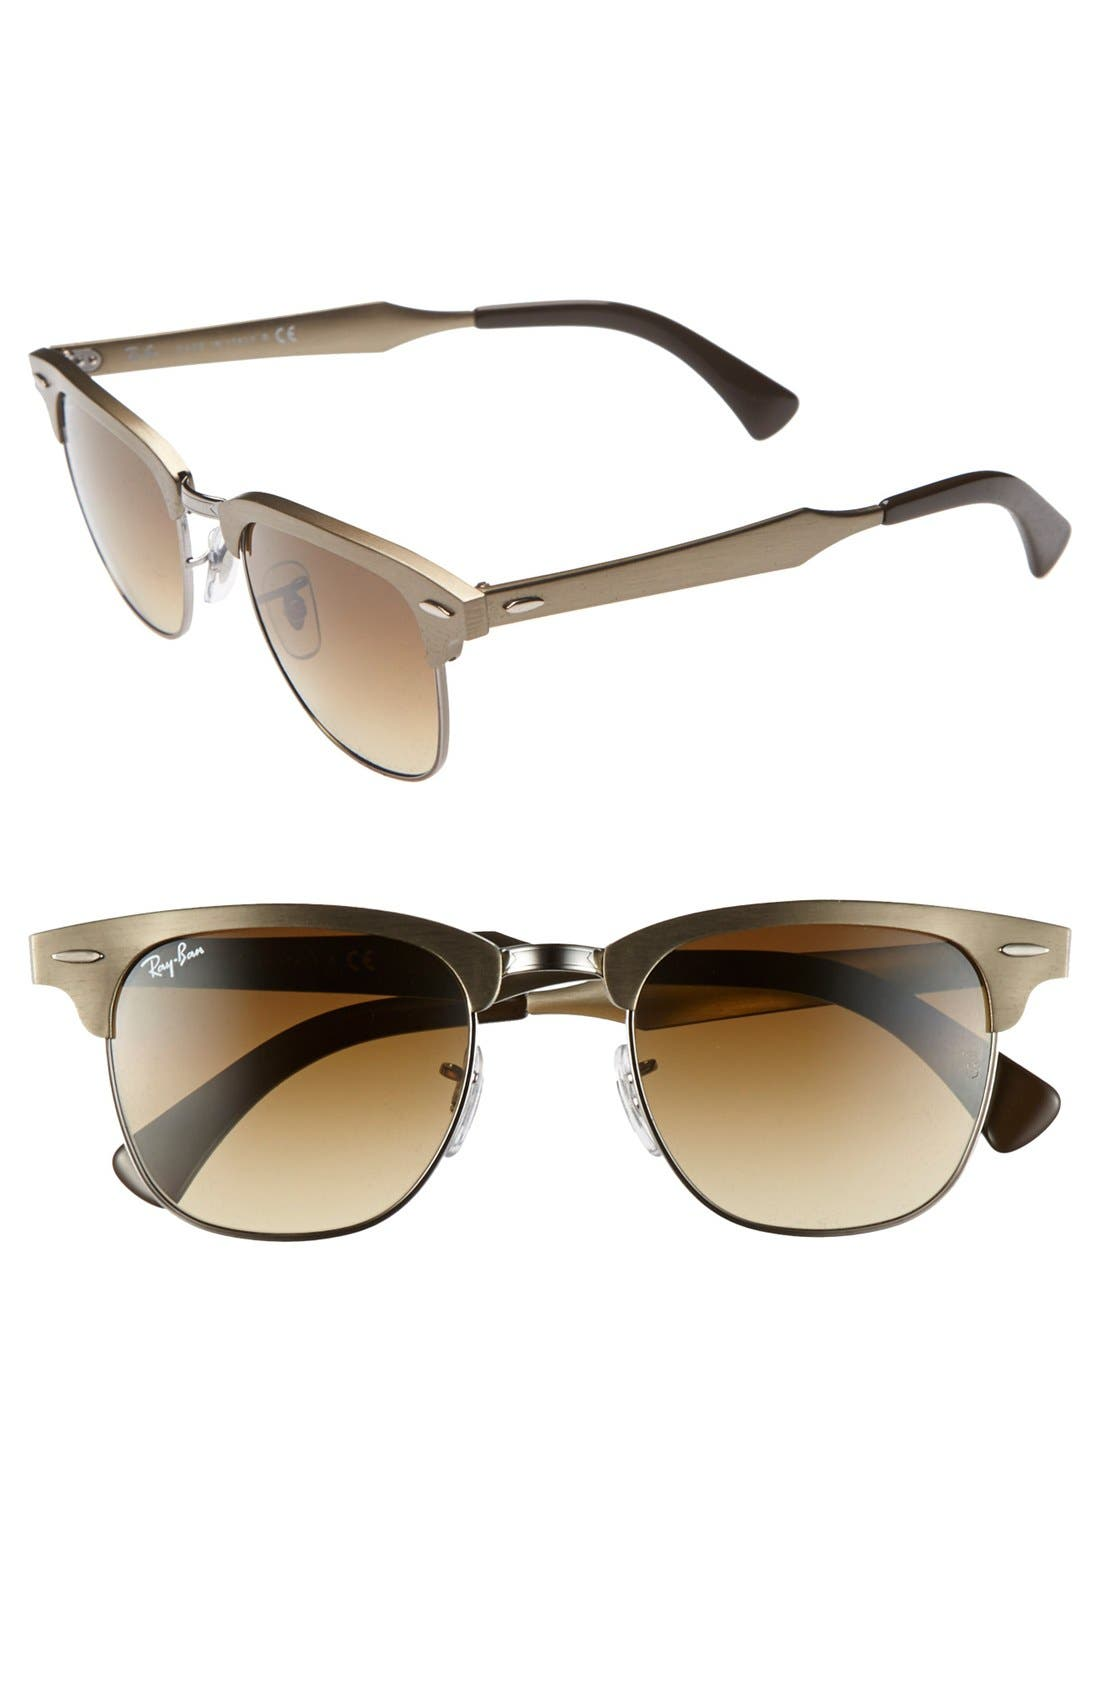 Main Image - Ray-Ban 'Clubmaster' 49mm Sunglasses